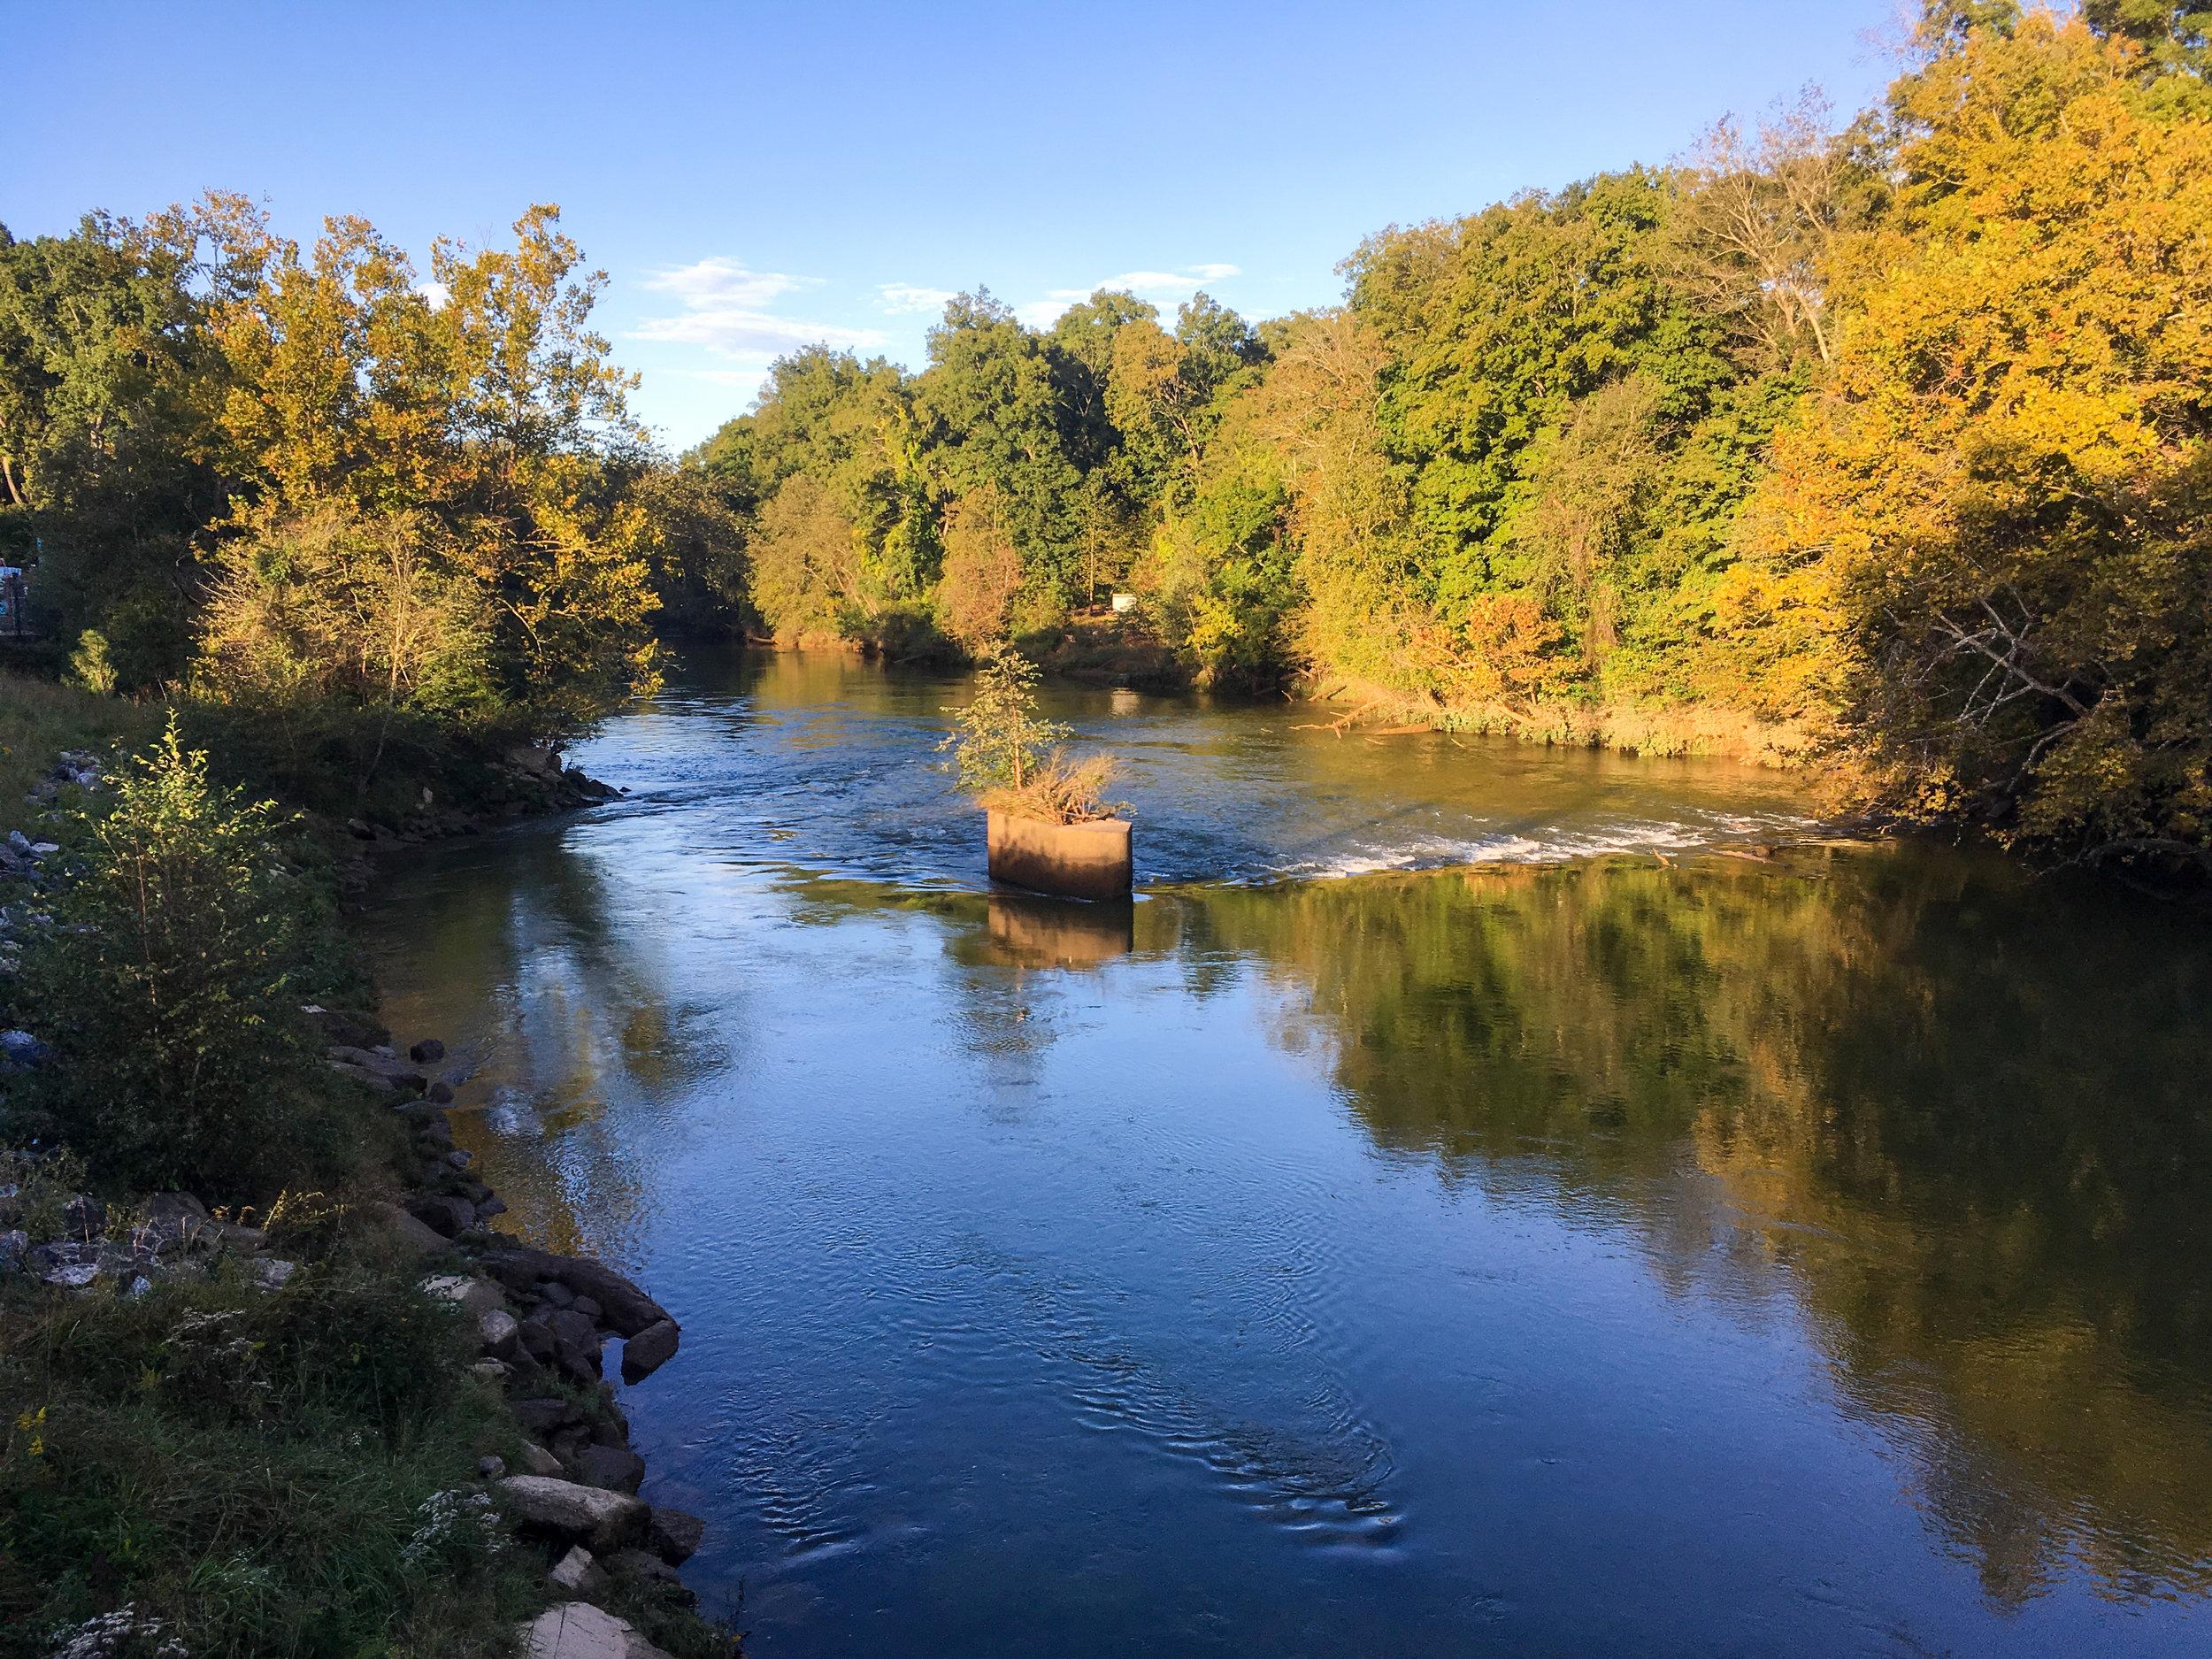 Remnant of original Holcomb Bridge, October 18, 2018